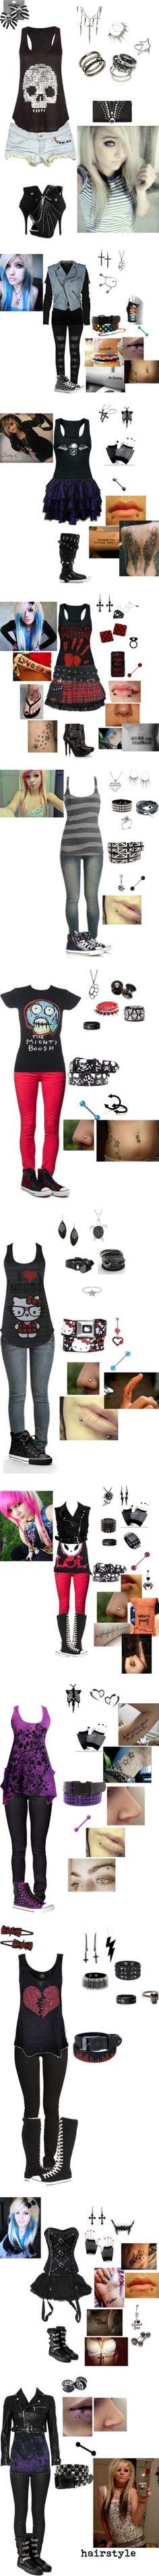 Hello Kitty Rock Bangle - USA (HLS) - Swarovski Online Shop